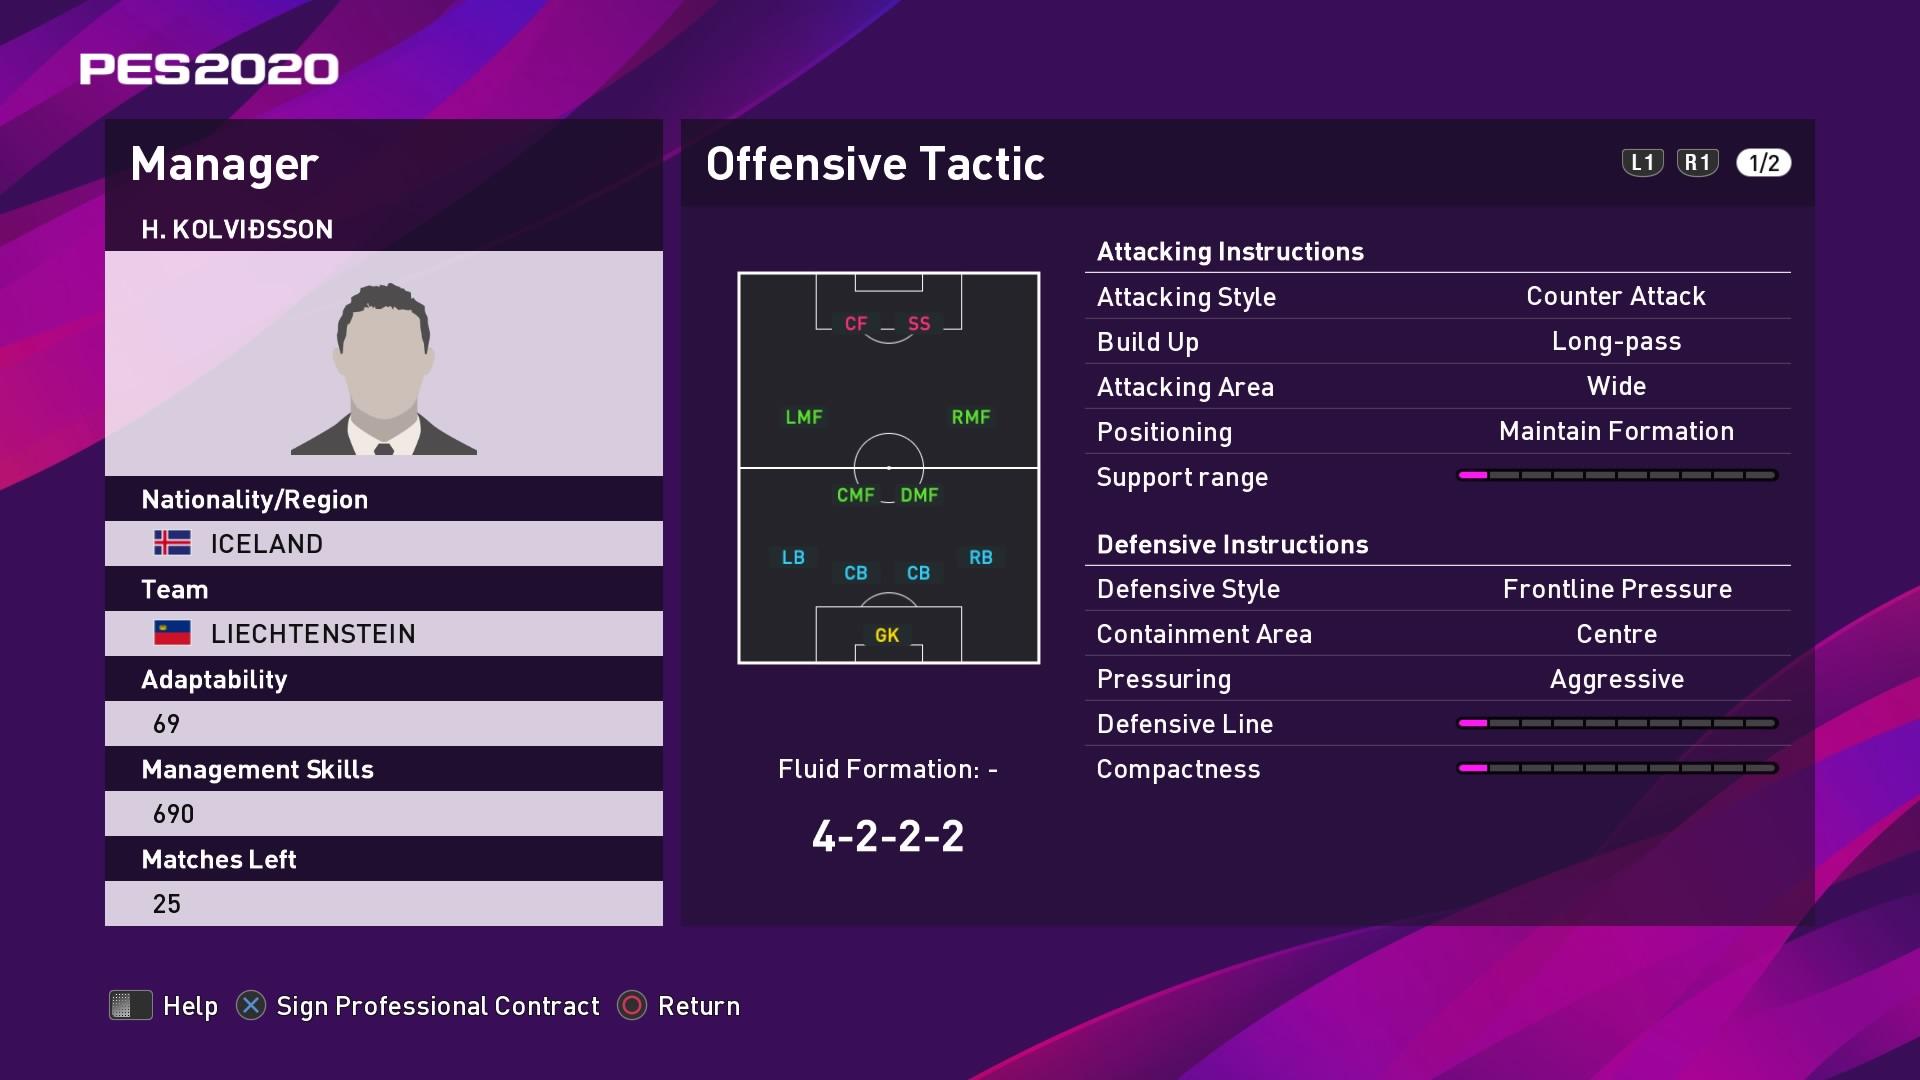 H. Kolviðsson (Helgi Kolviðsson) Offensive Tactic in PES 2020 myClub